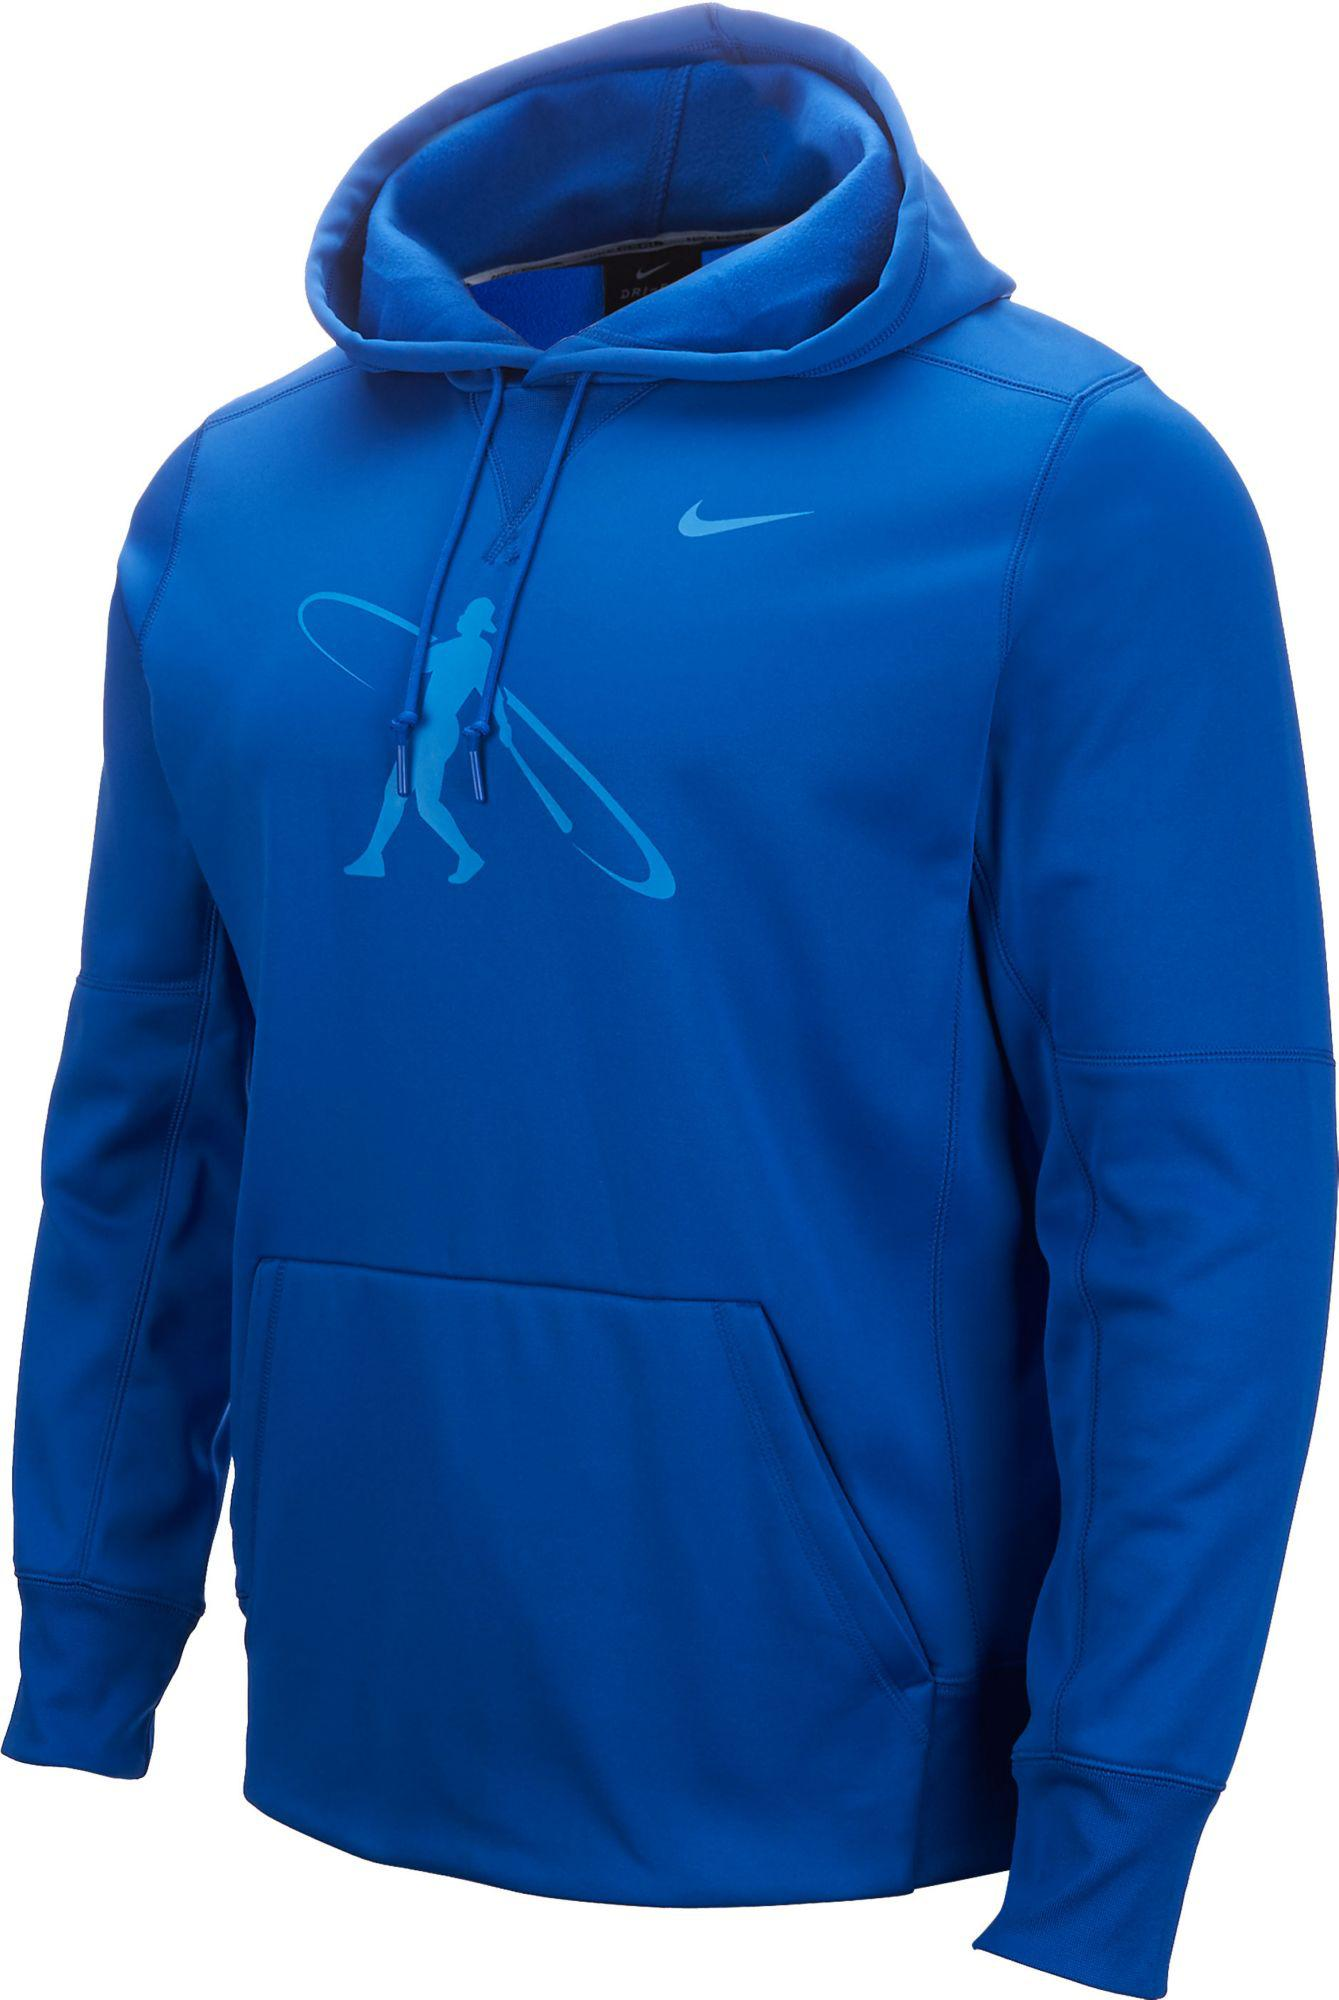 b574152e9ff Nike Swingman Baseball Hoodie in Blue for Men - Lyst